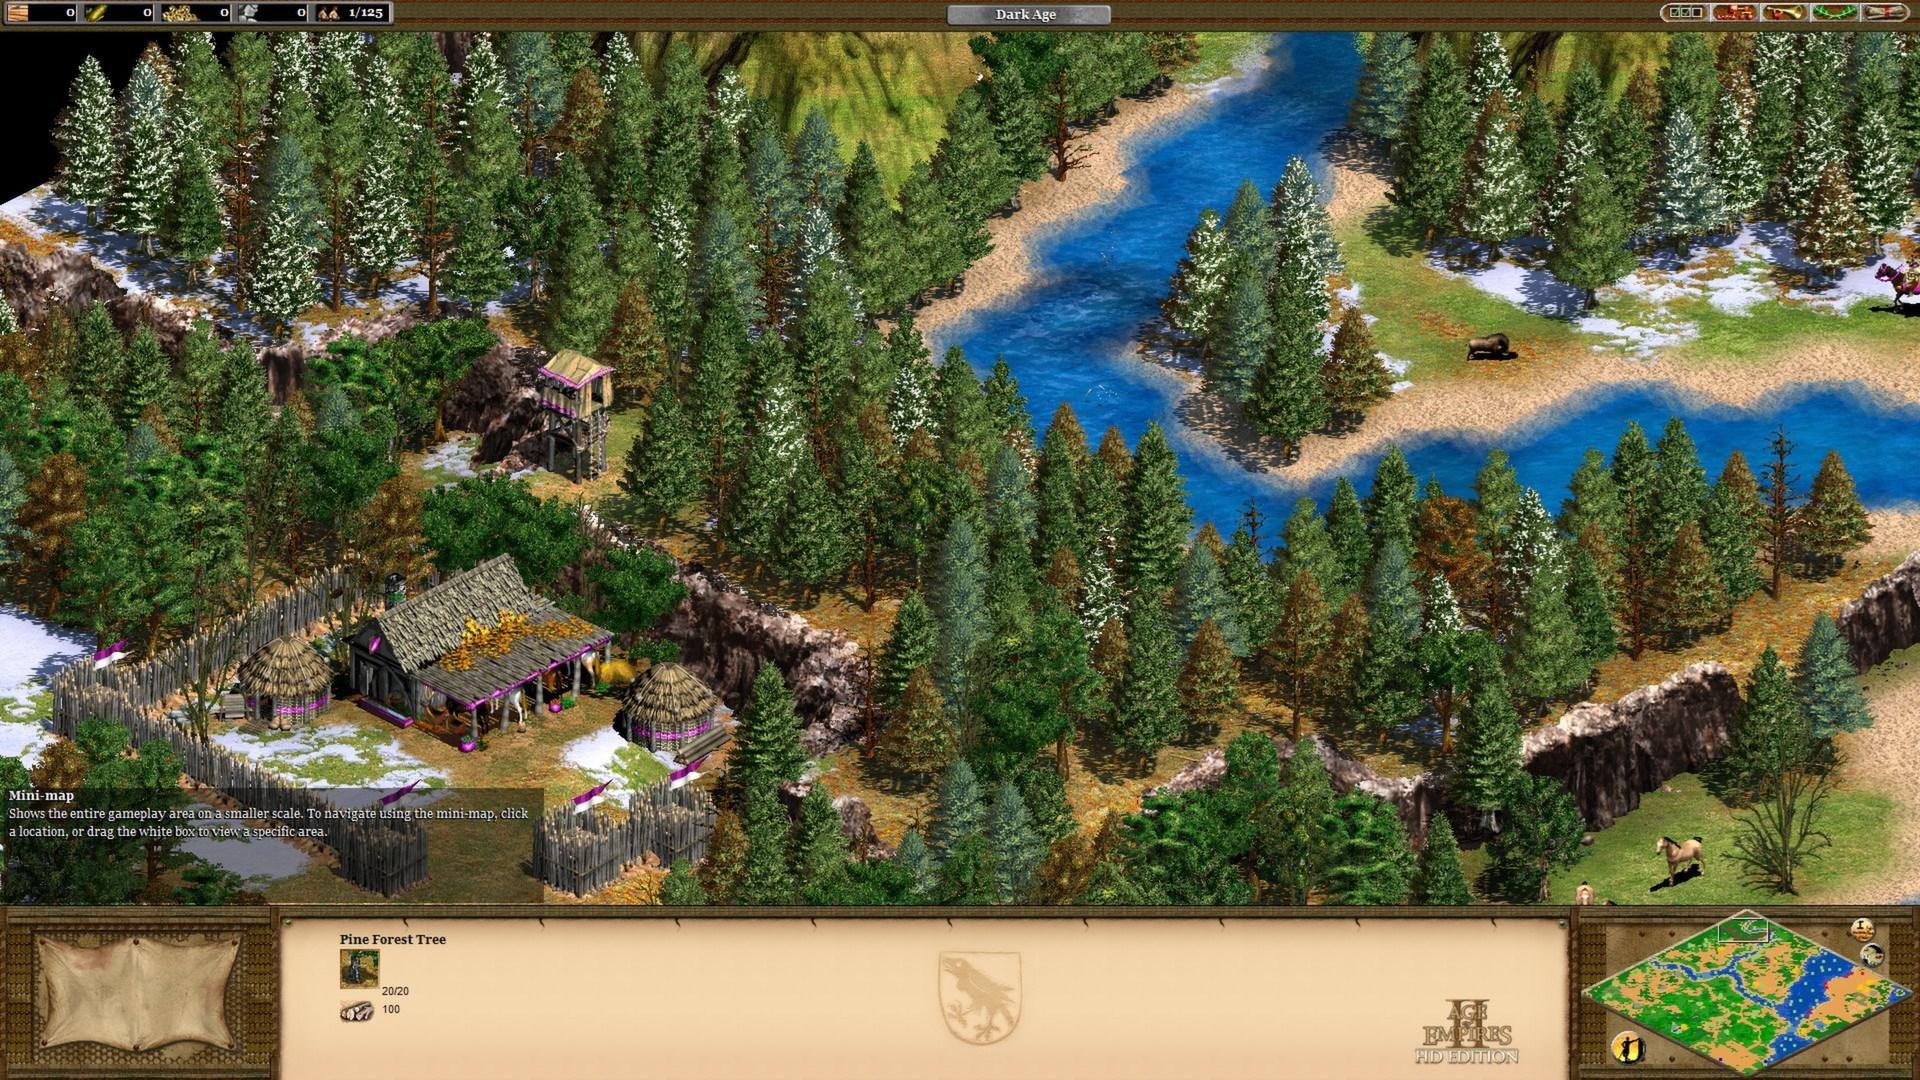 Age of Empires II HD Screenshot 7